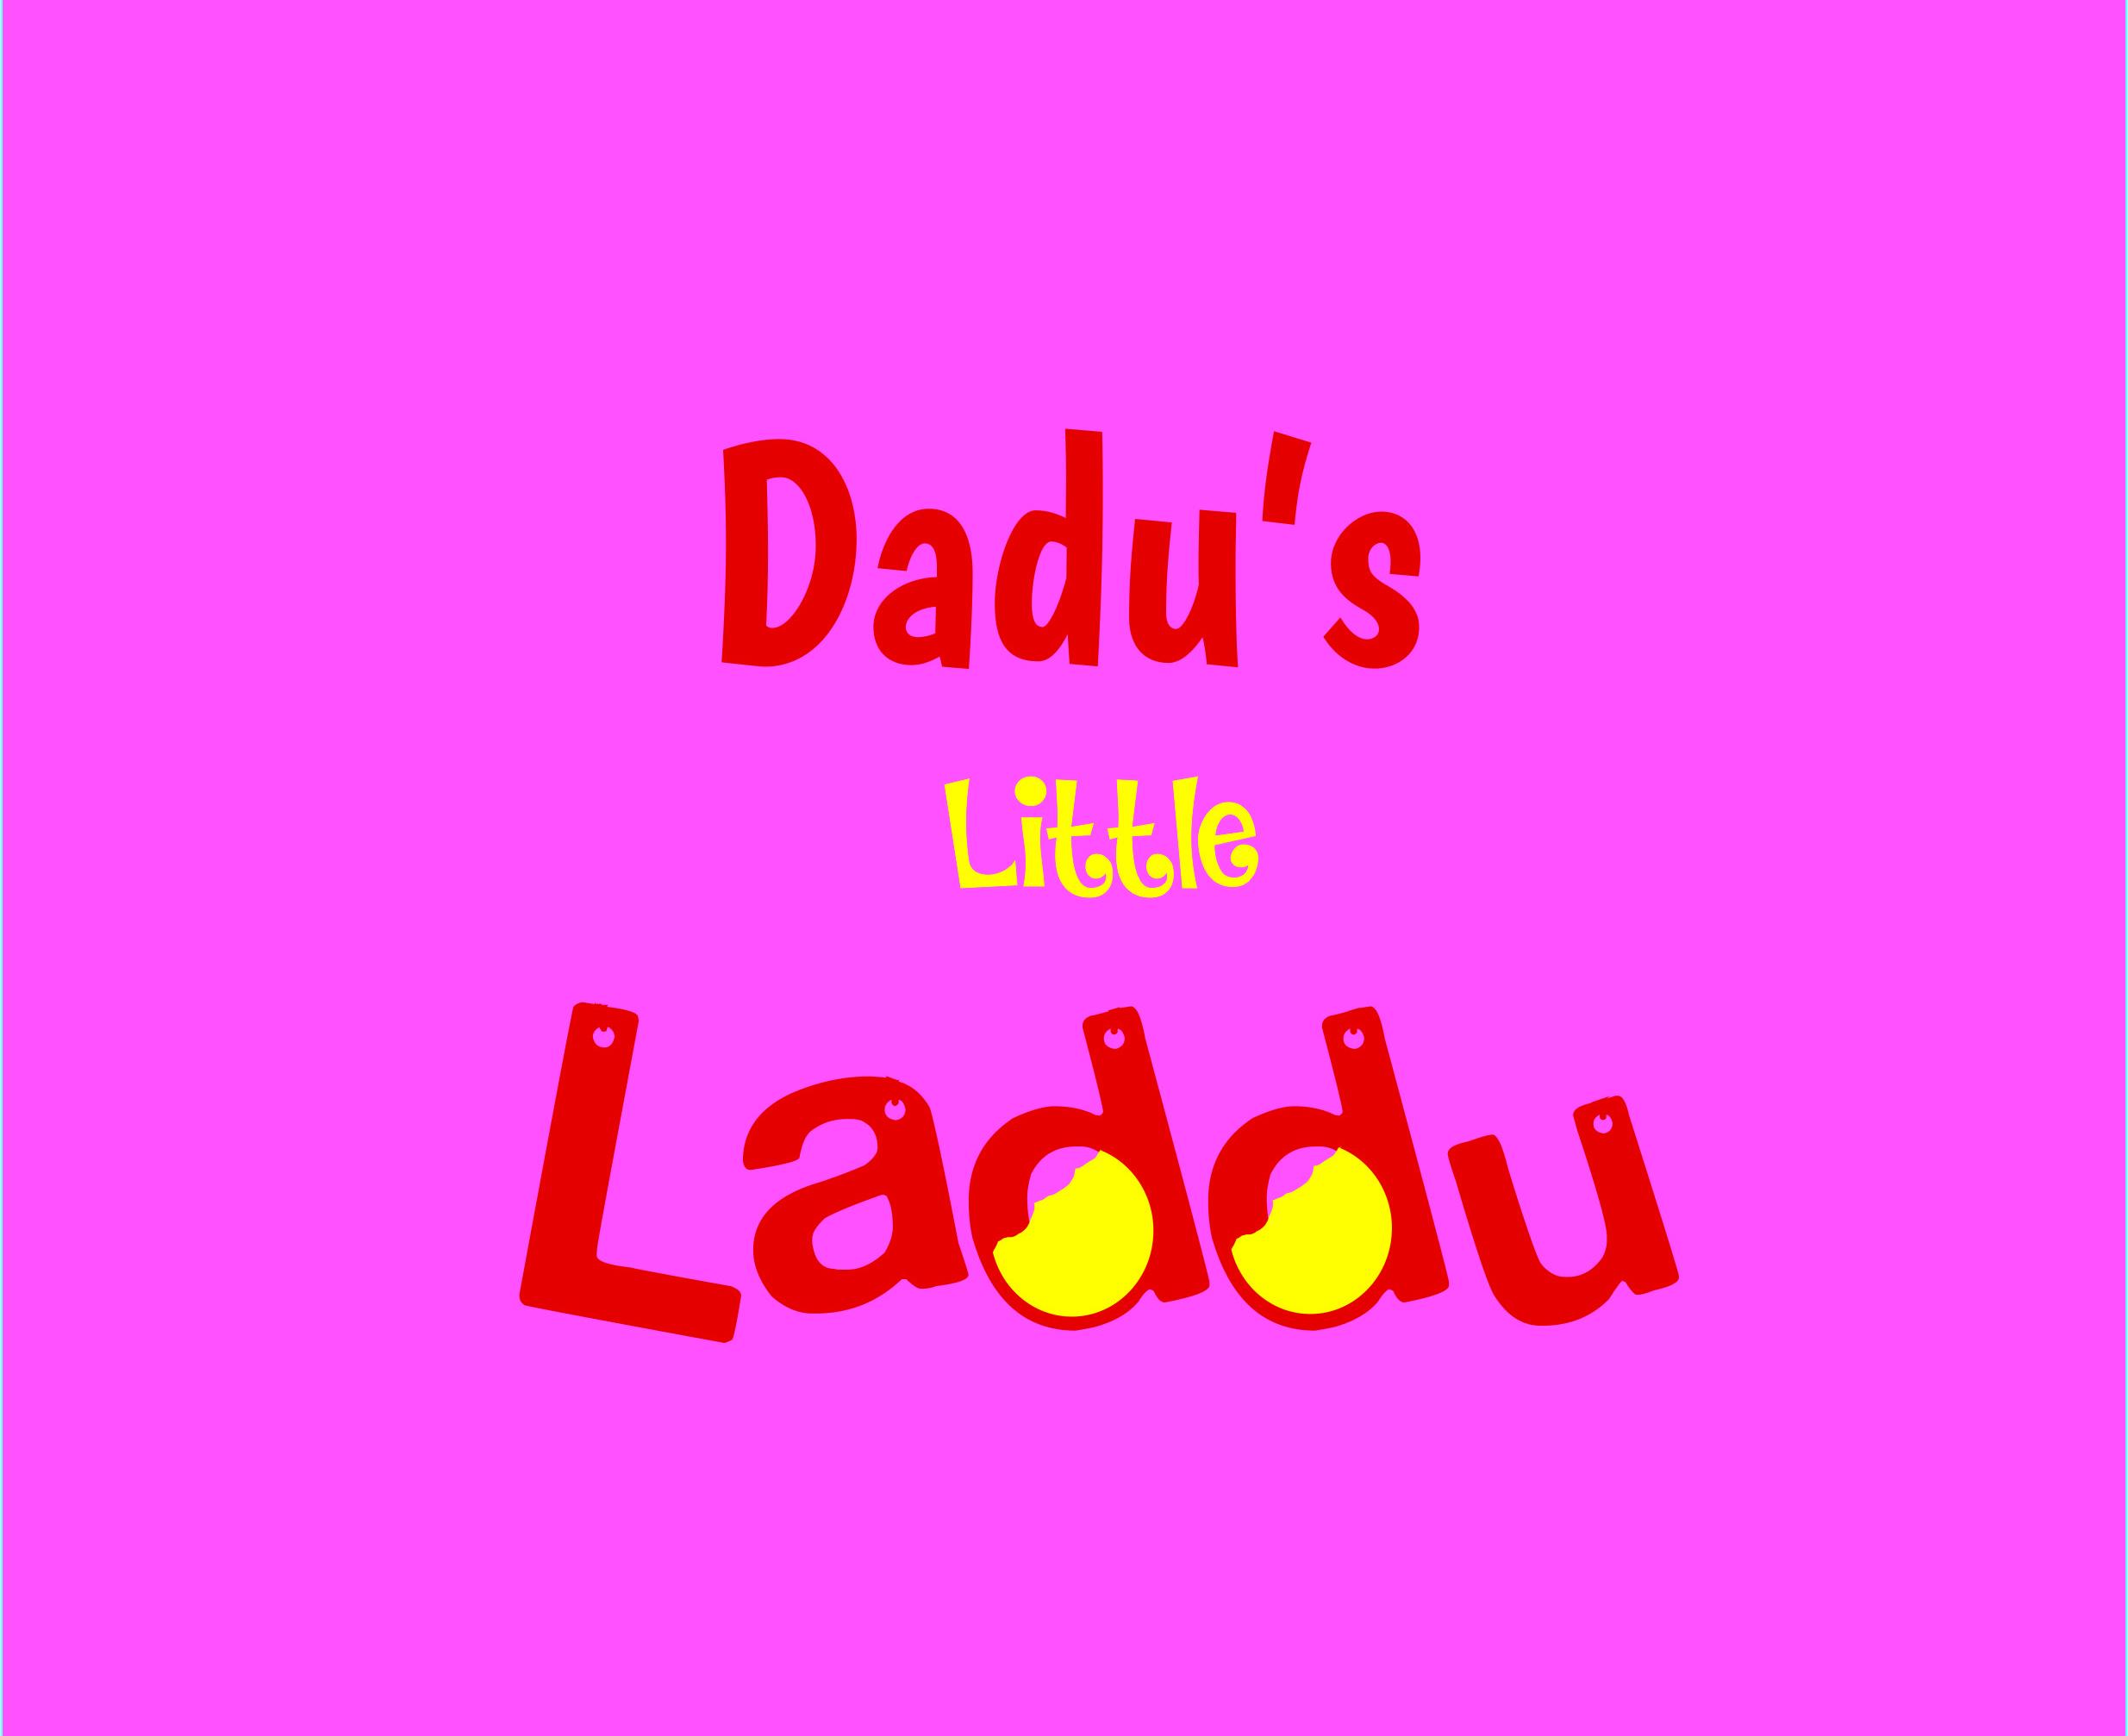 DADDUS-LITTLE-LADDU-P.jpg